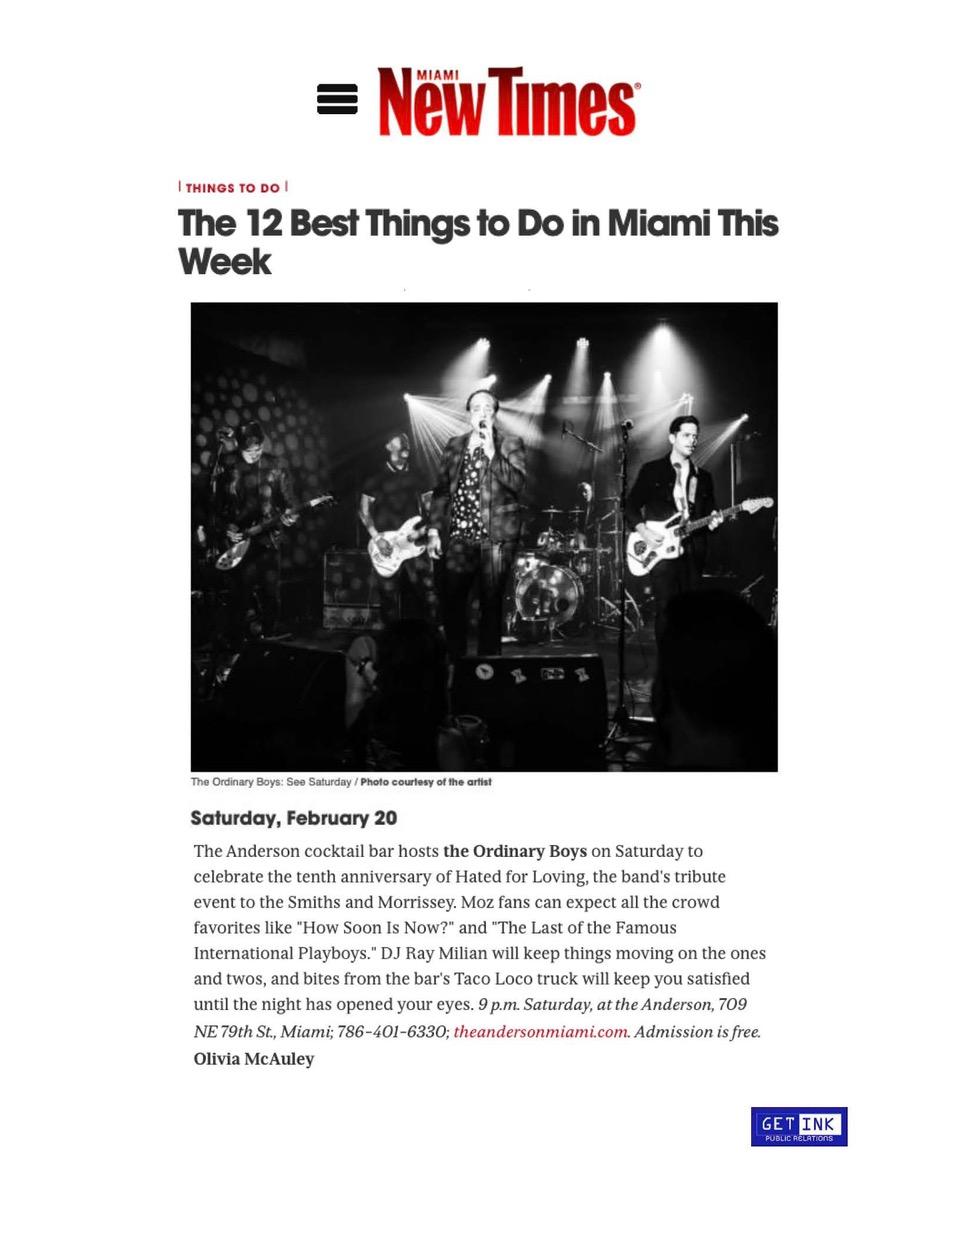 The Anderson Miami in Miami New Times - Get Ink PR